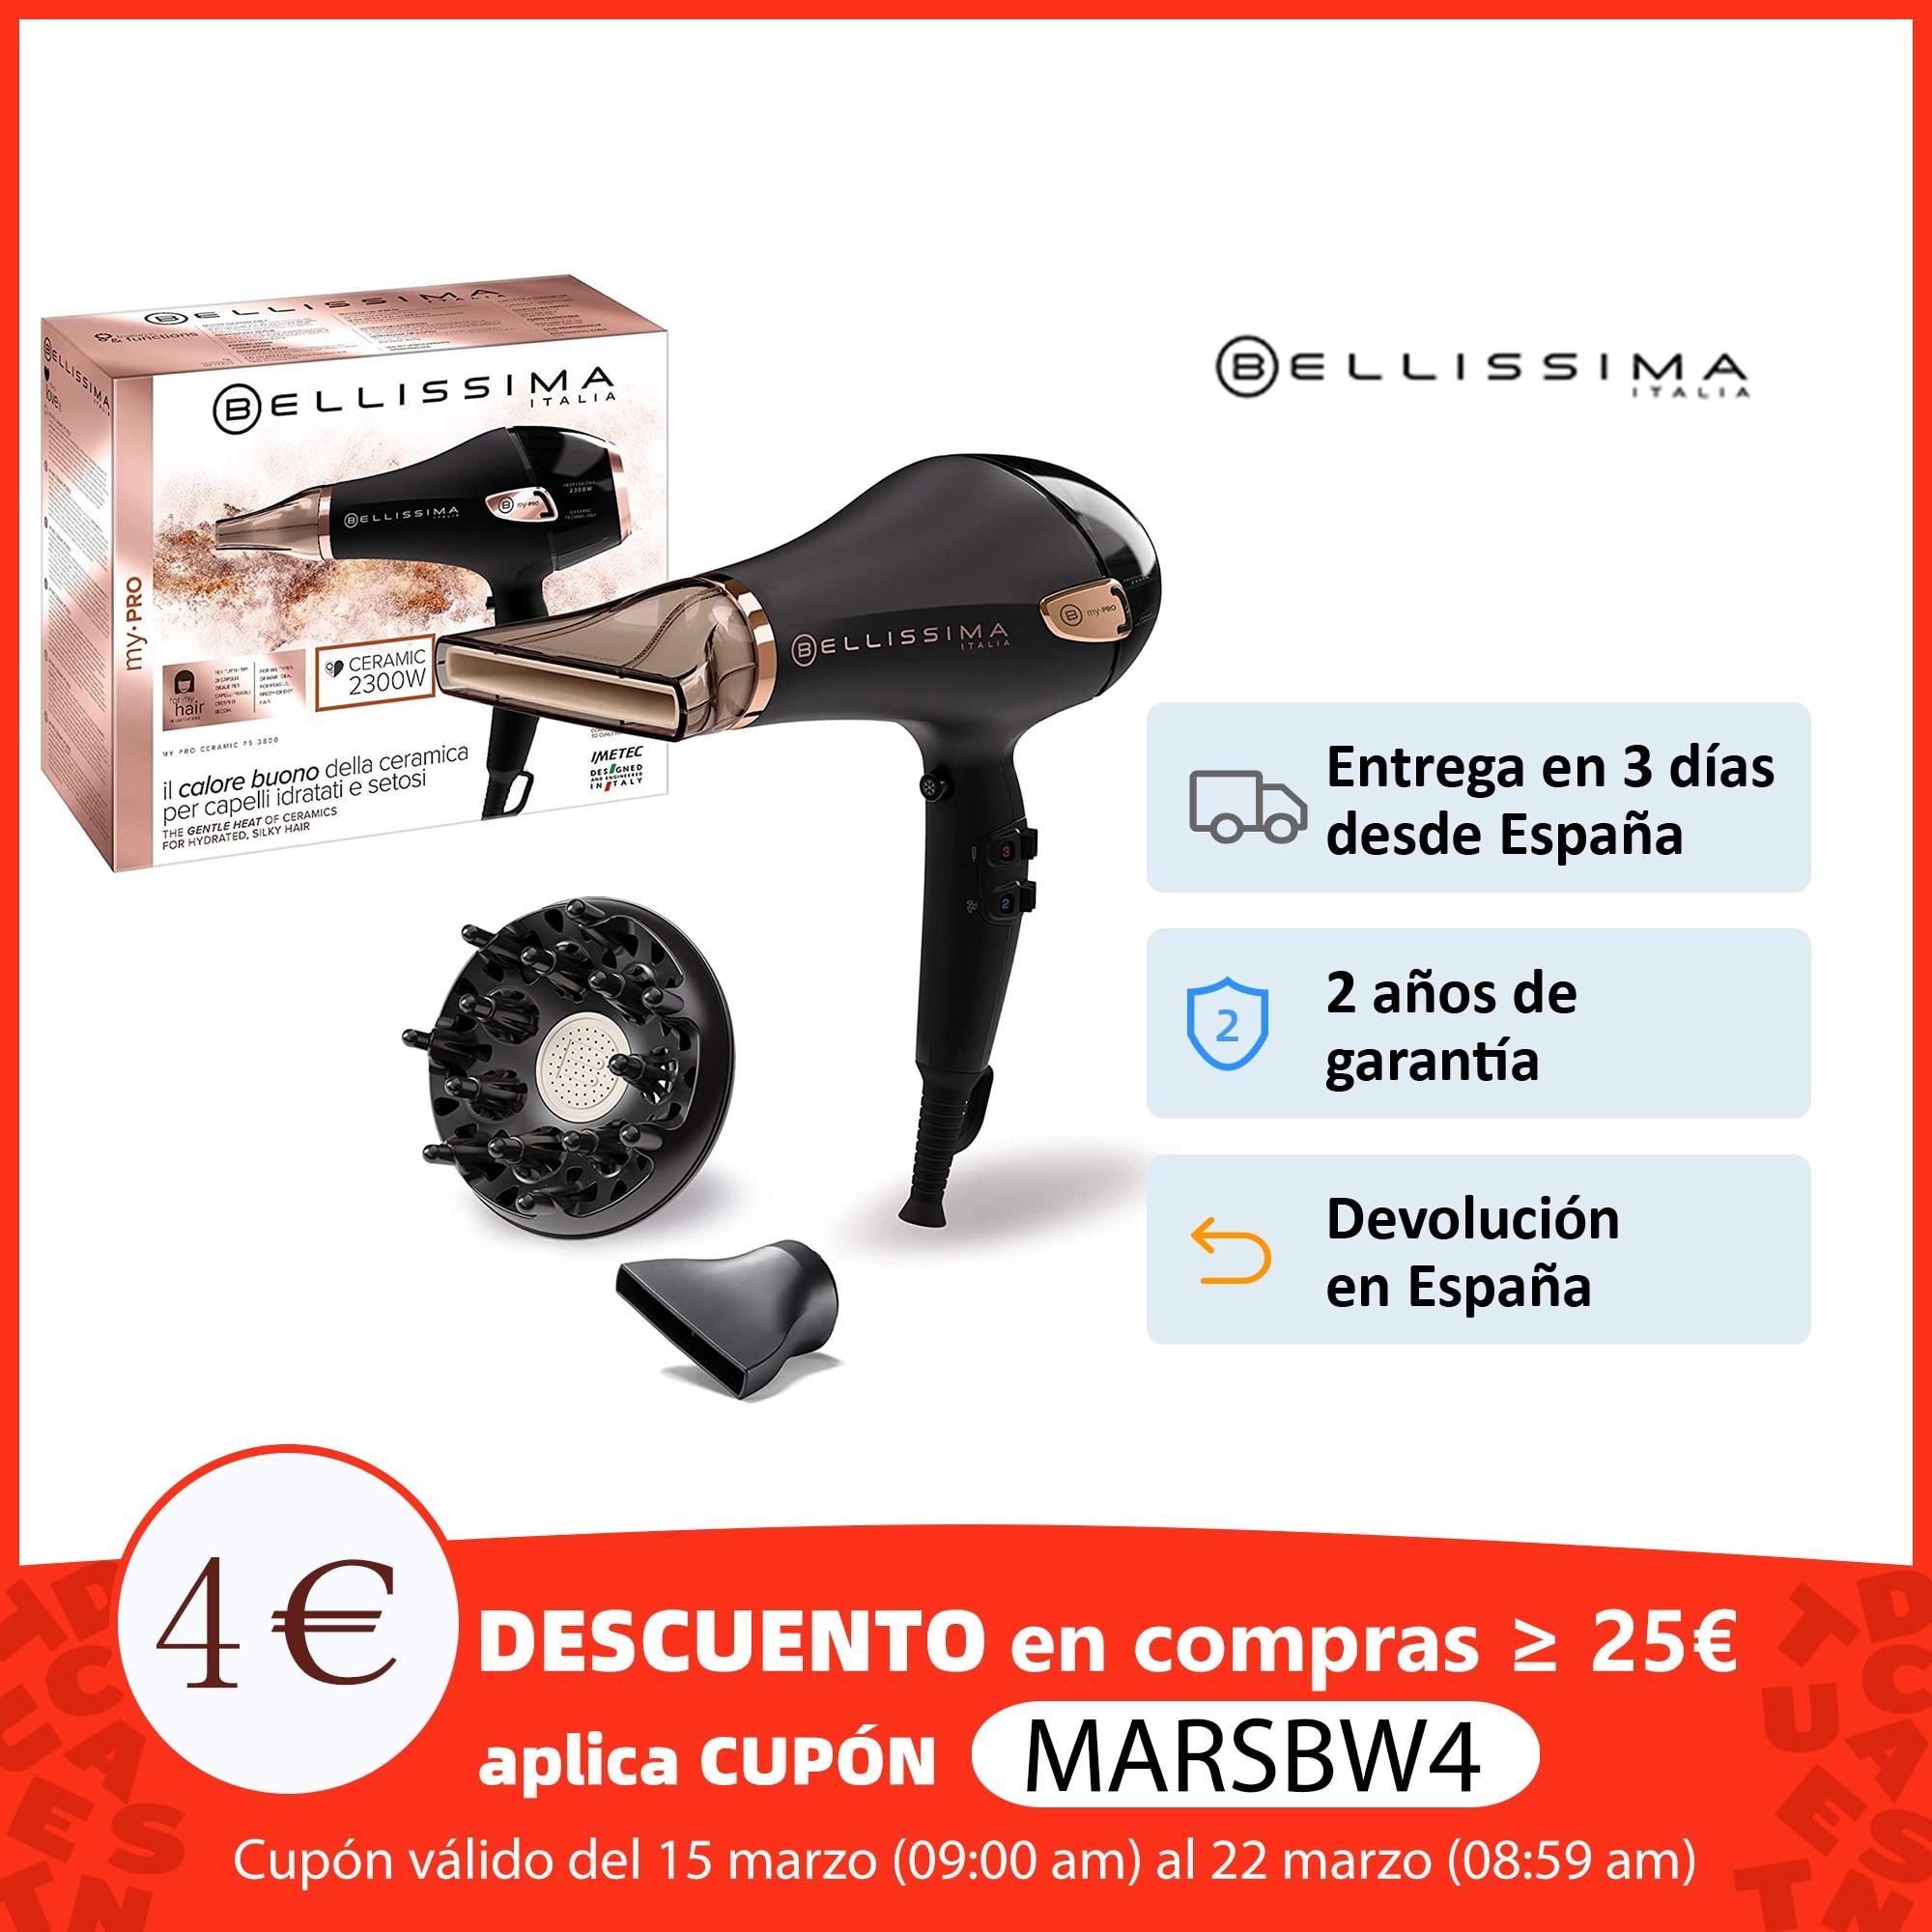 Bellissima Secador de Pelo My Pro Ceramic P5 3800 para unos Rizos Naturales   Secador de Cabello   Secadores profesionales    - AliExpress